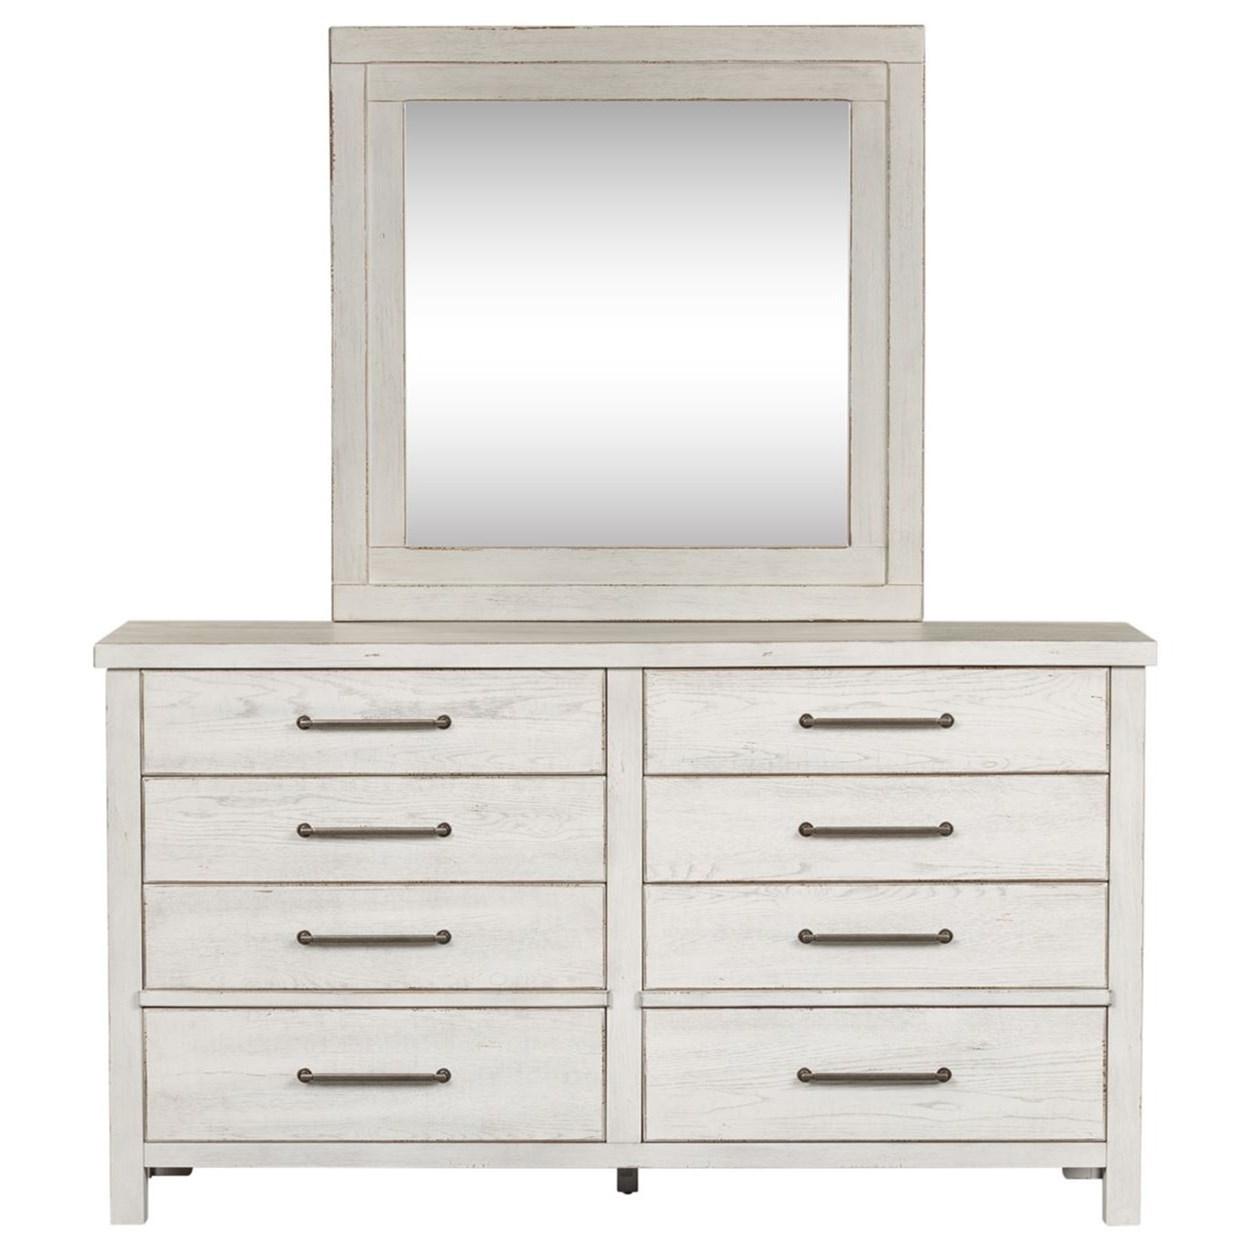 Contemporary 8-Drawer Dresser and Mirror Set